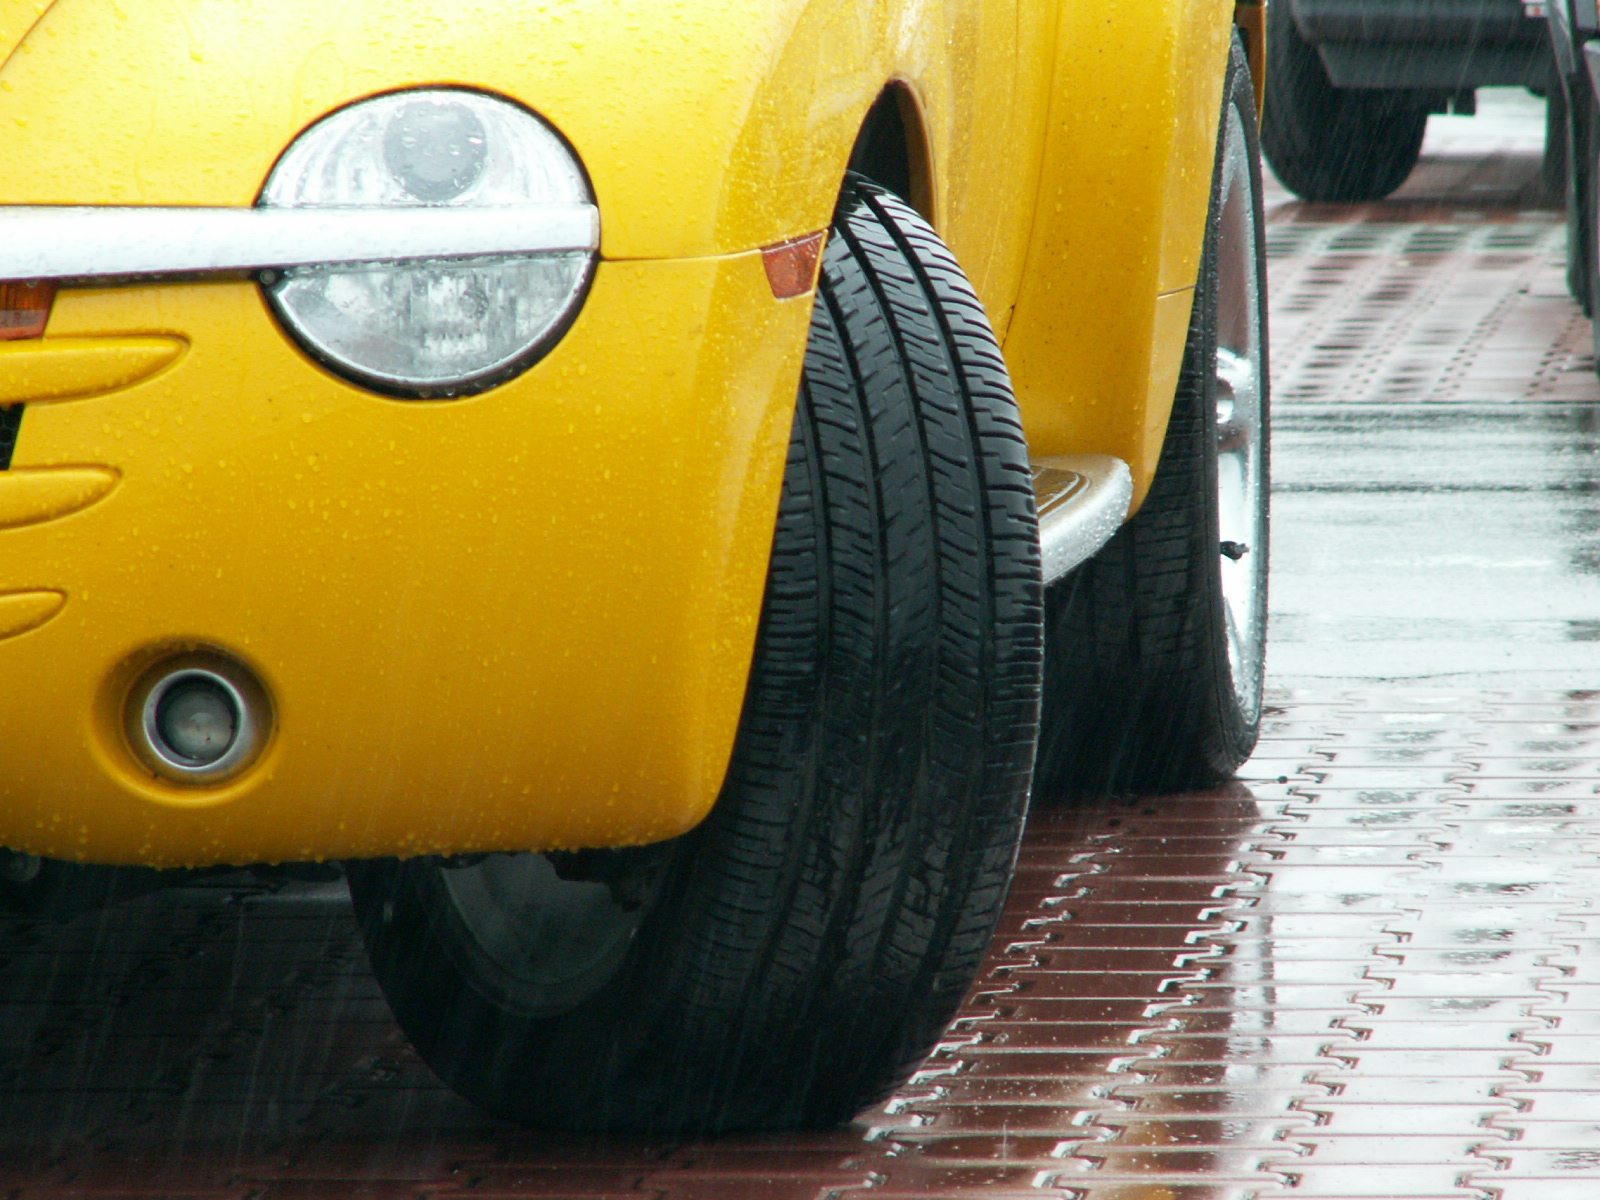 Melding over 'quicky' in geparkeerde auto Hendrik-Ido-Ambacht